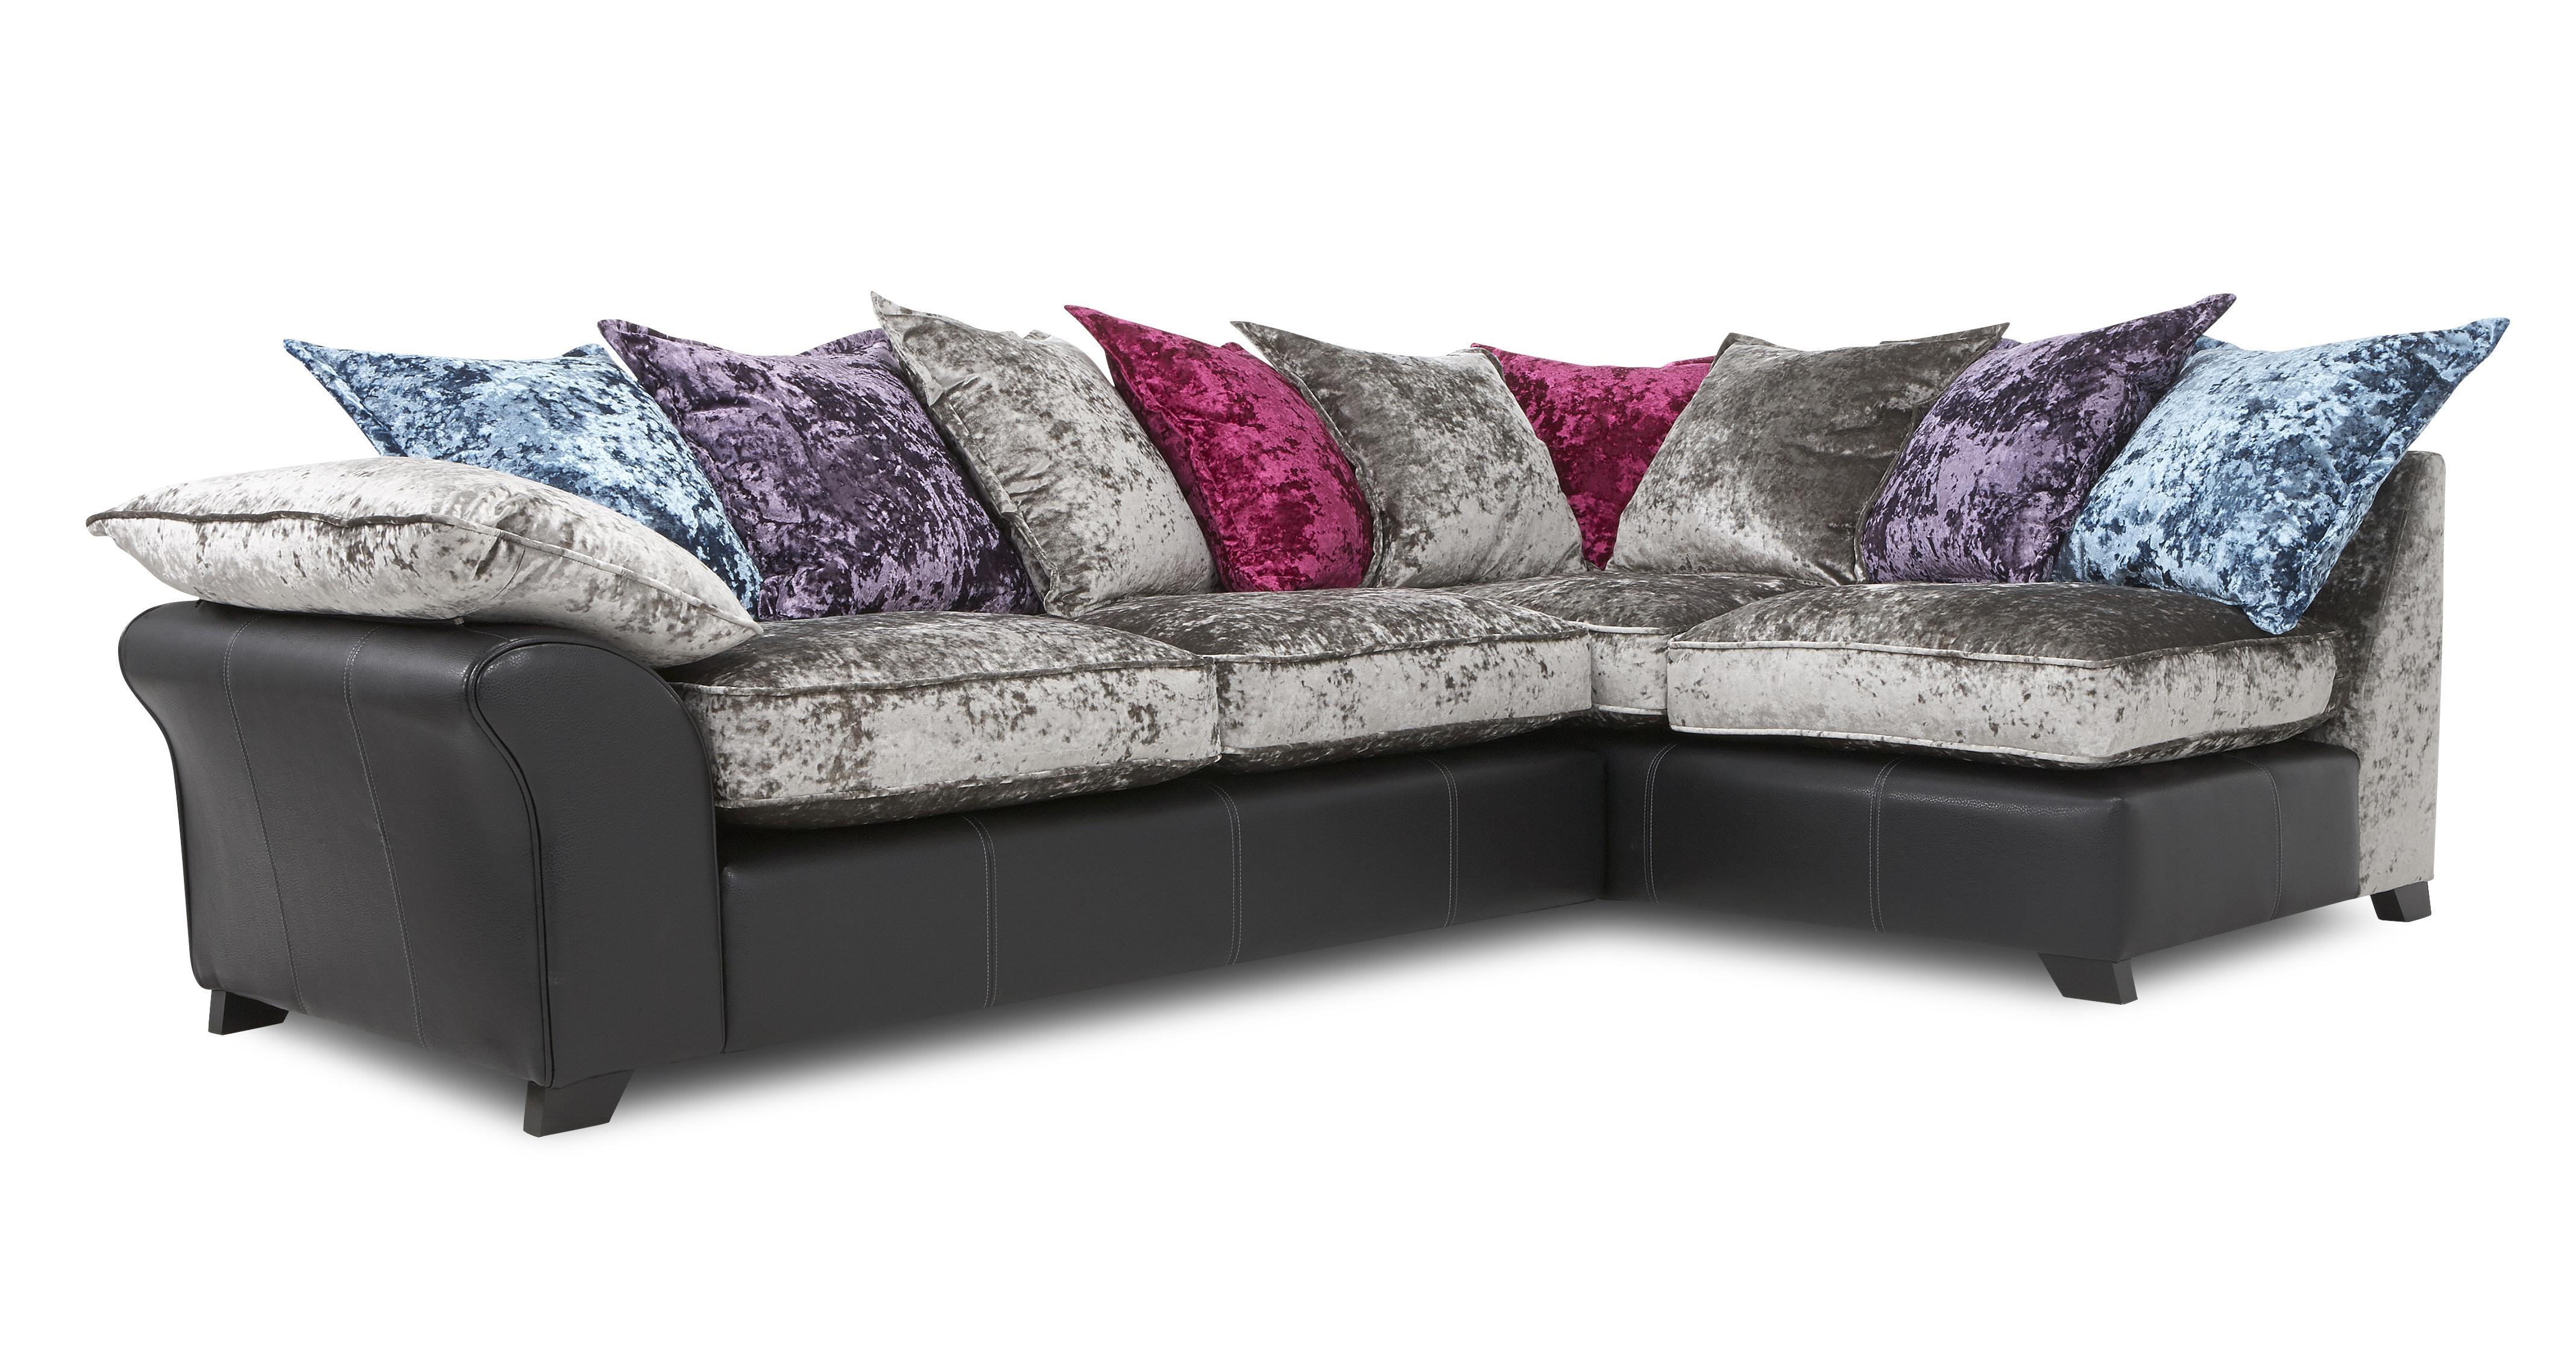 dfs corner sofa and swivel chair loveseat sleeper full sequence large half